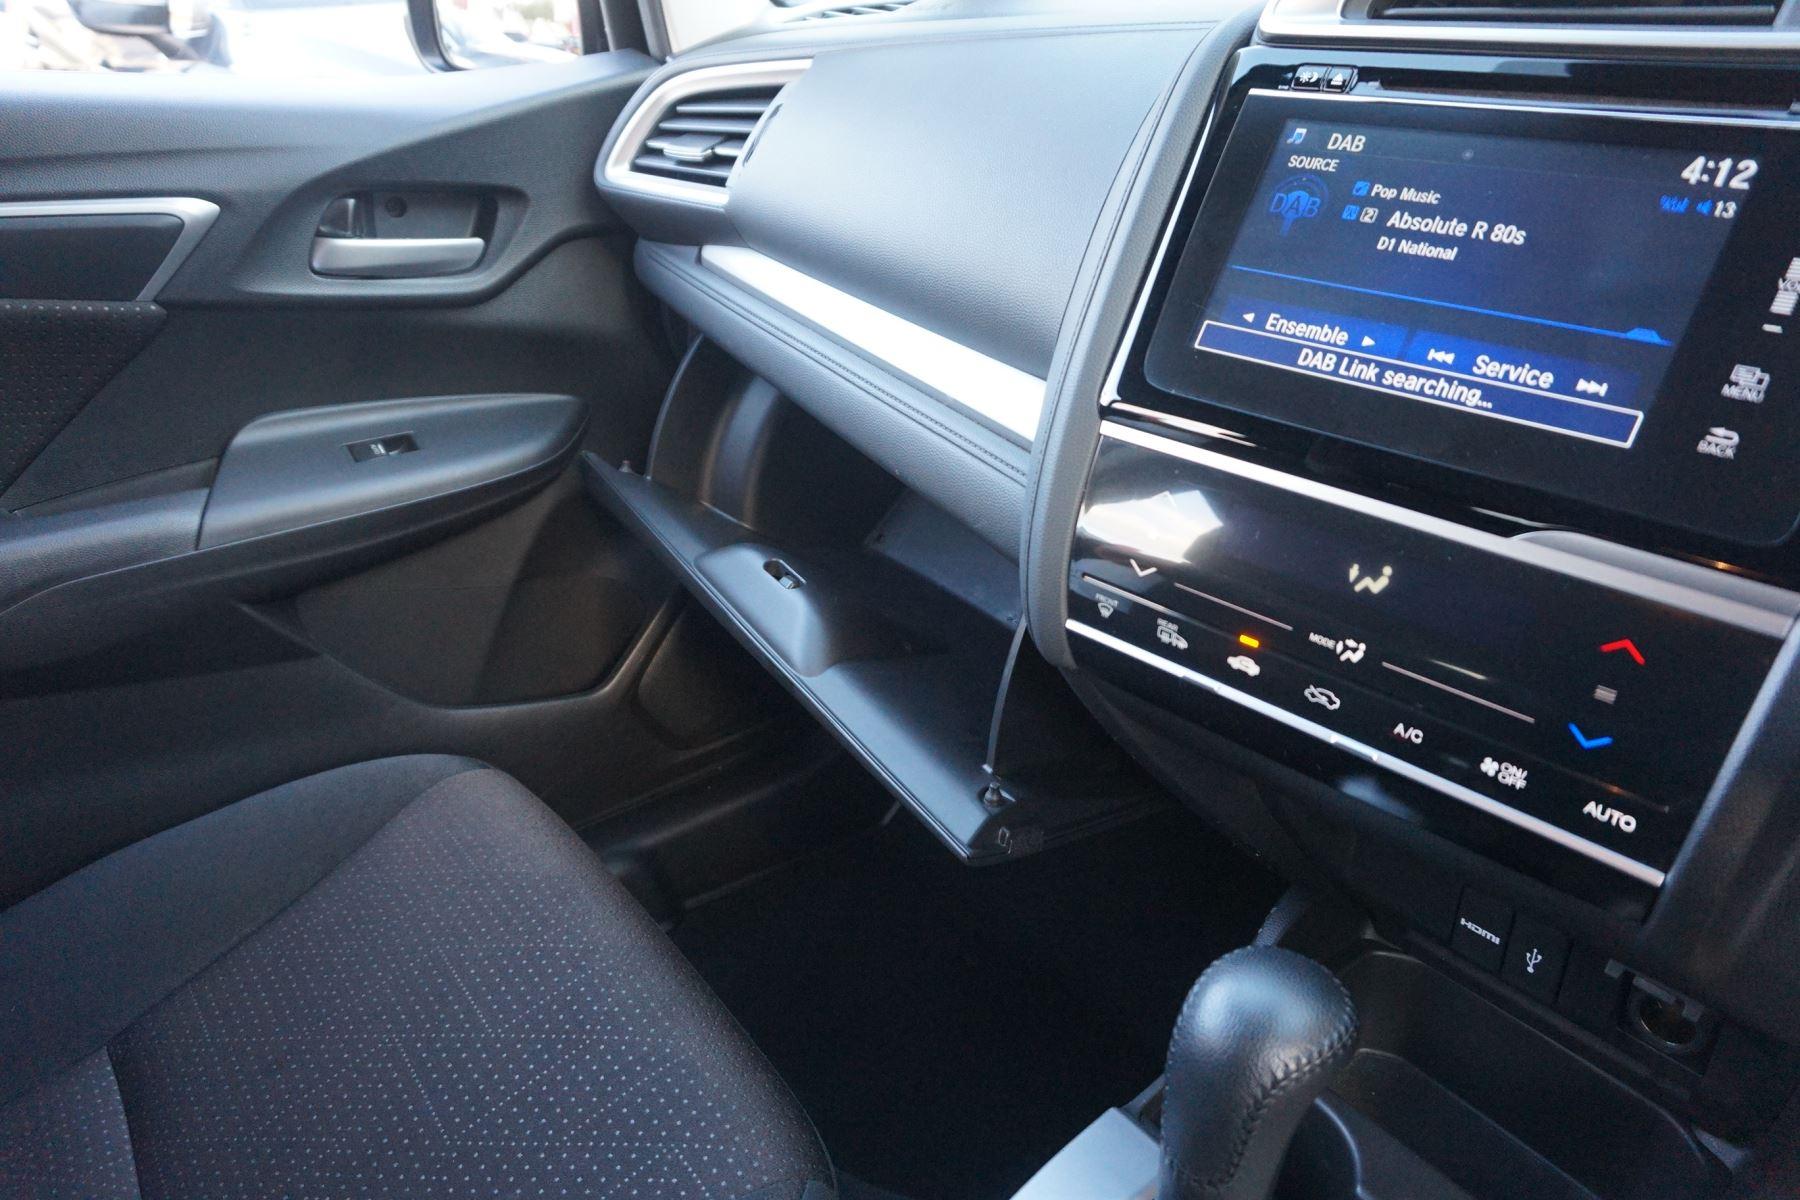 Honda Jazz 1.3 EX CVT image 18